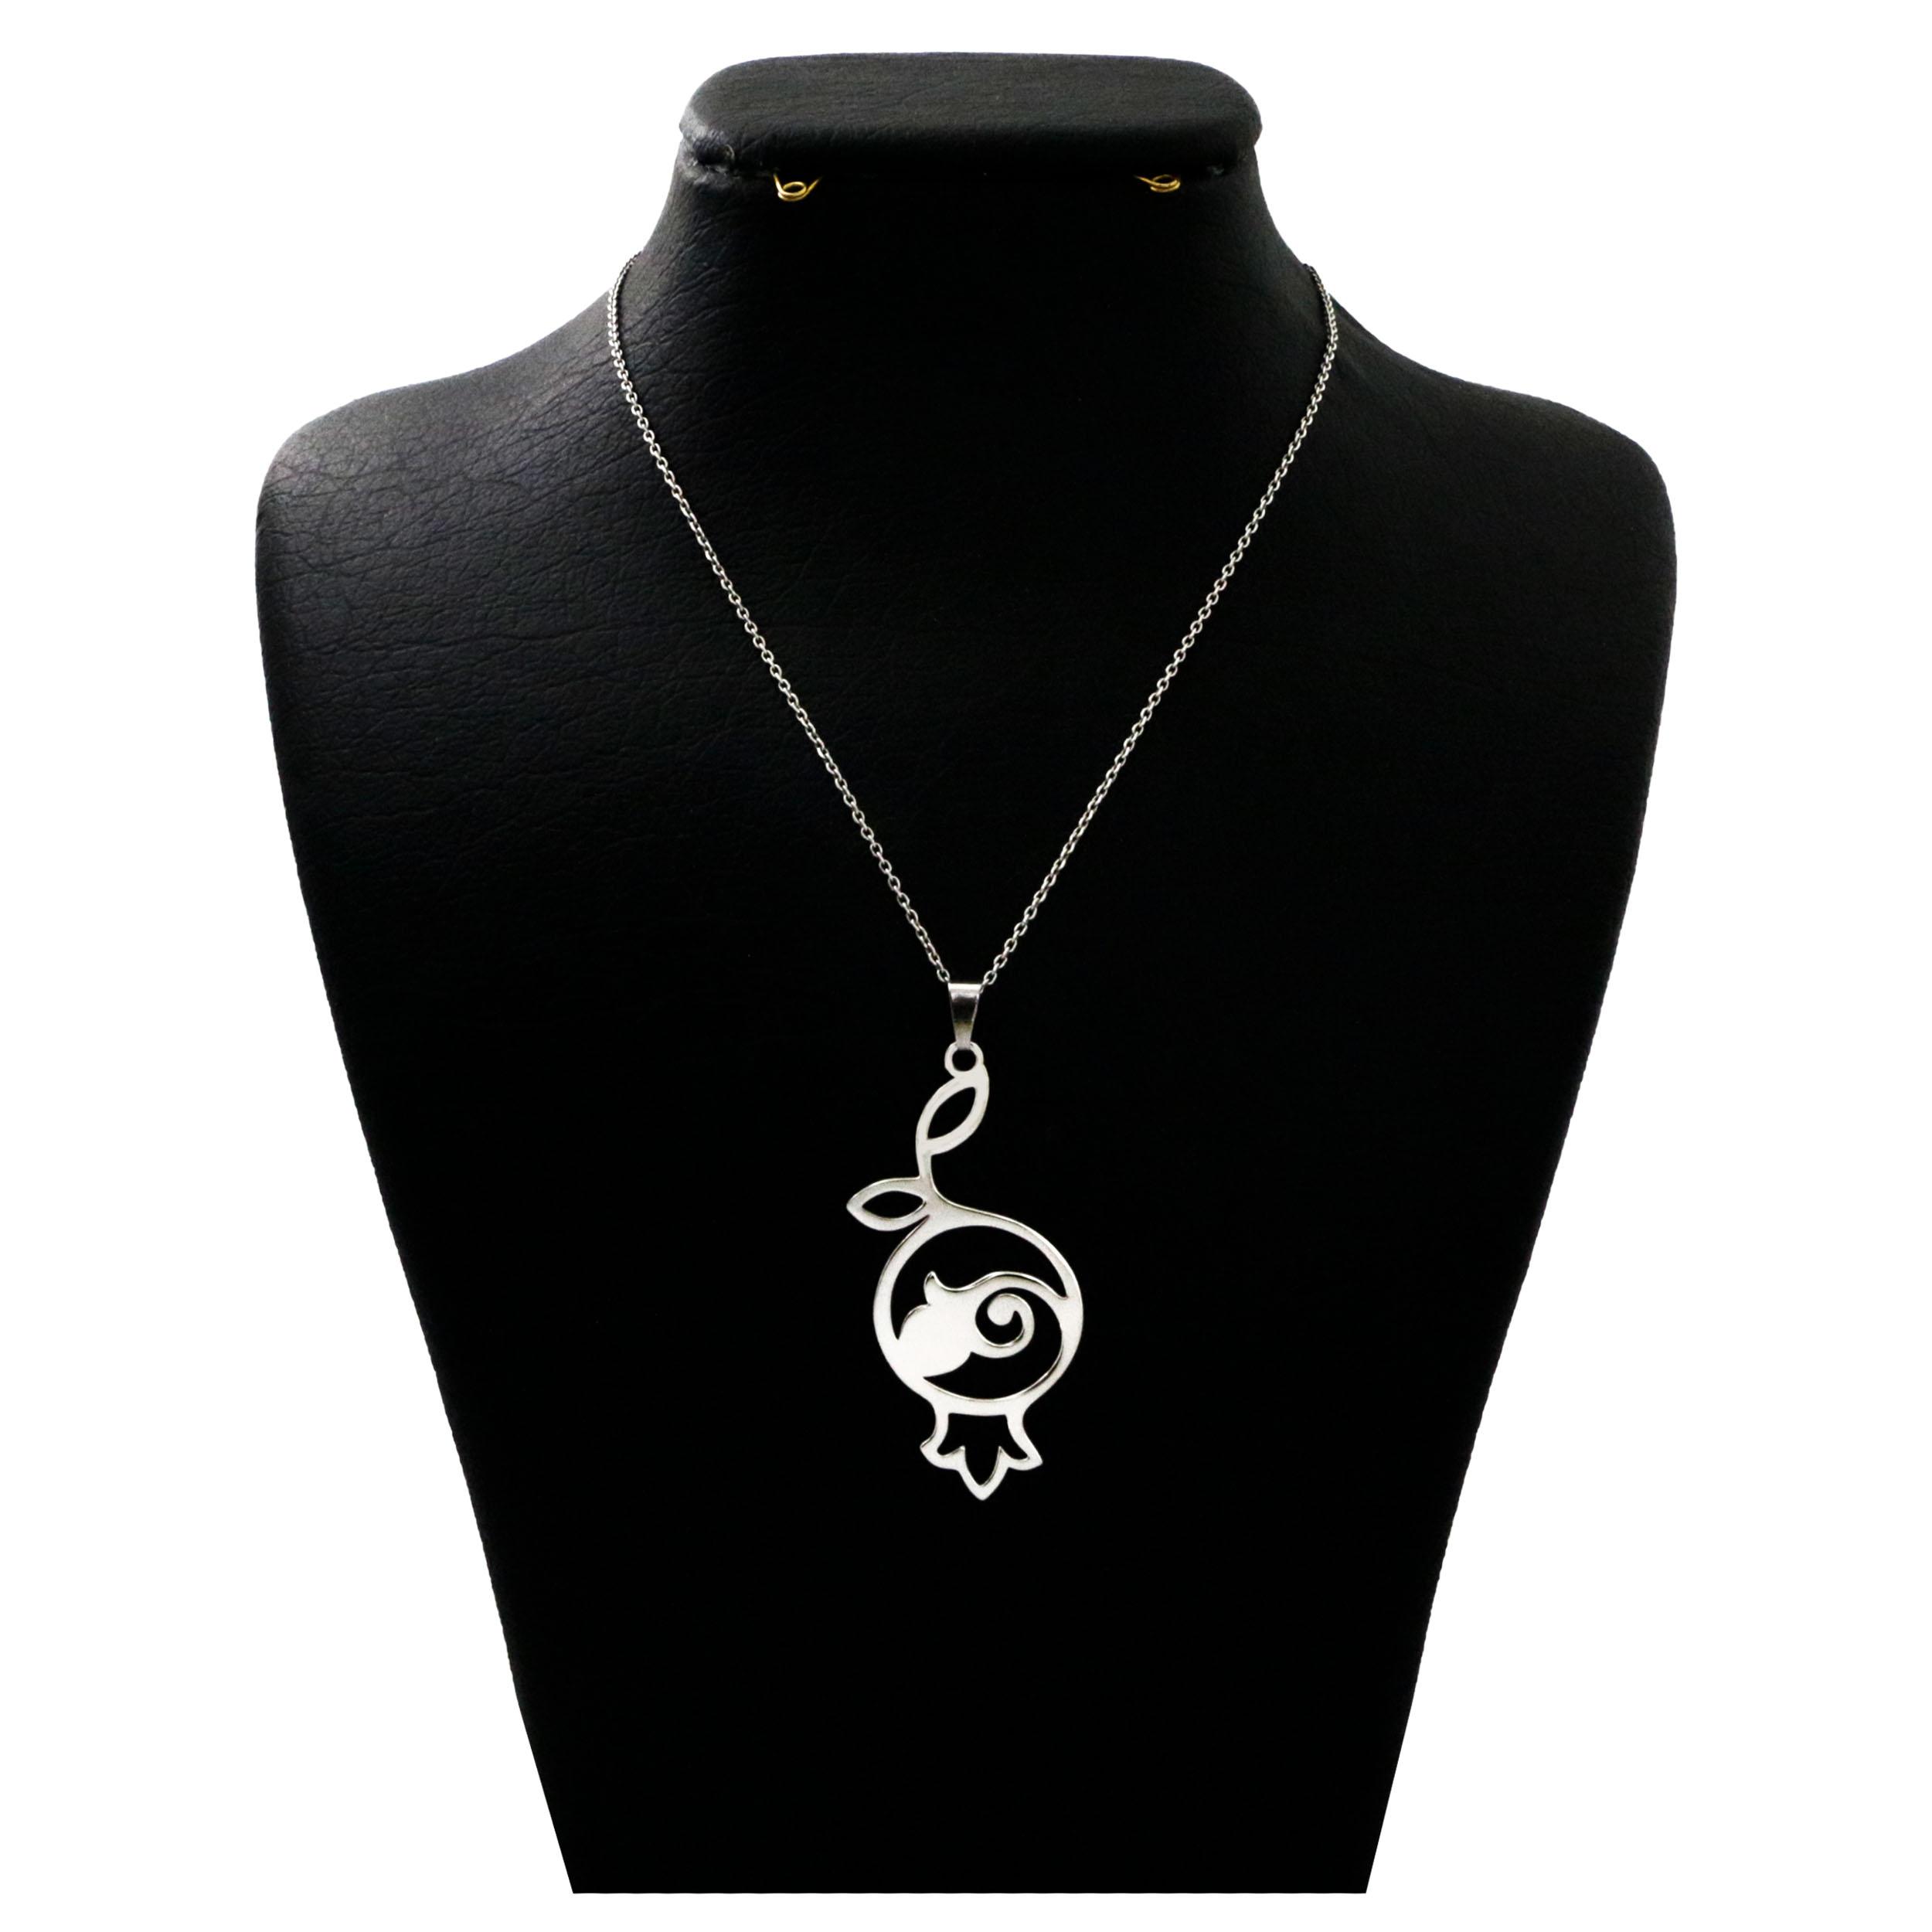 گردنبند نقره زنانه  دلی جم طرح انار شب یلدا  کد D 393